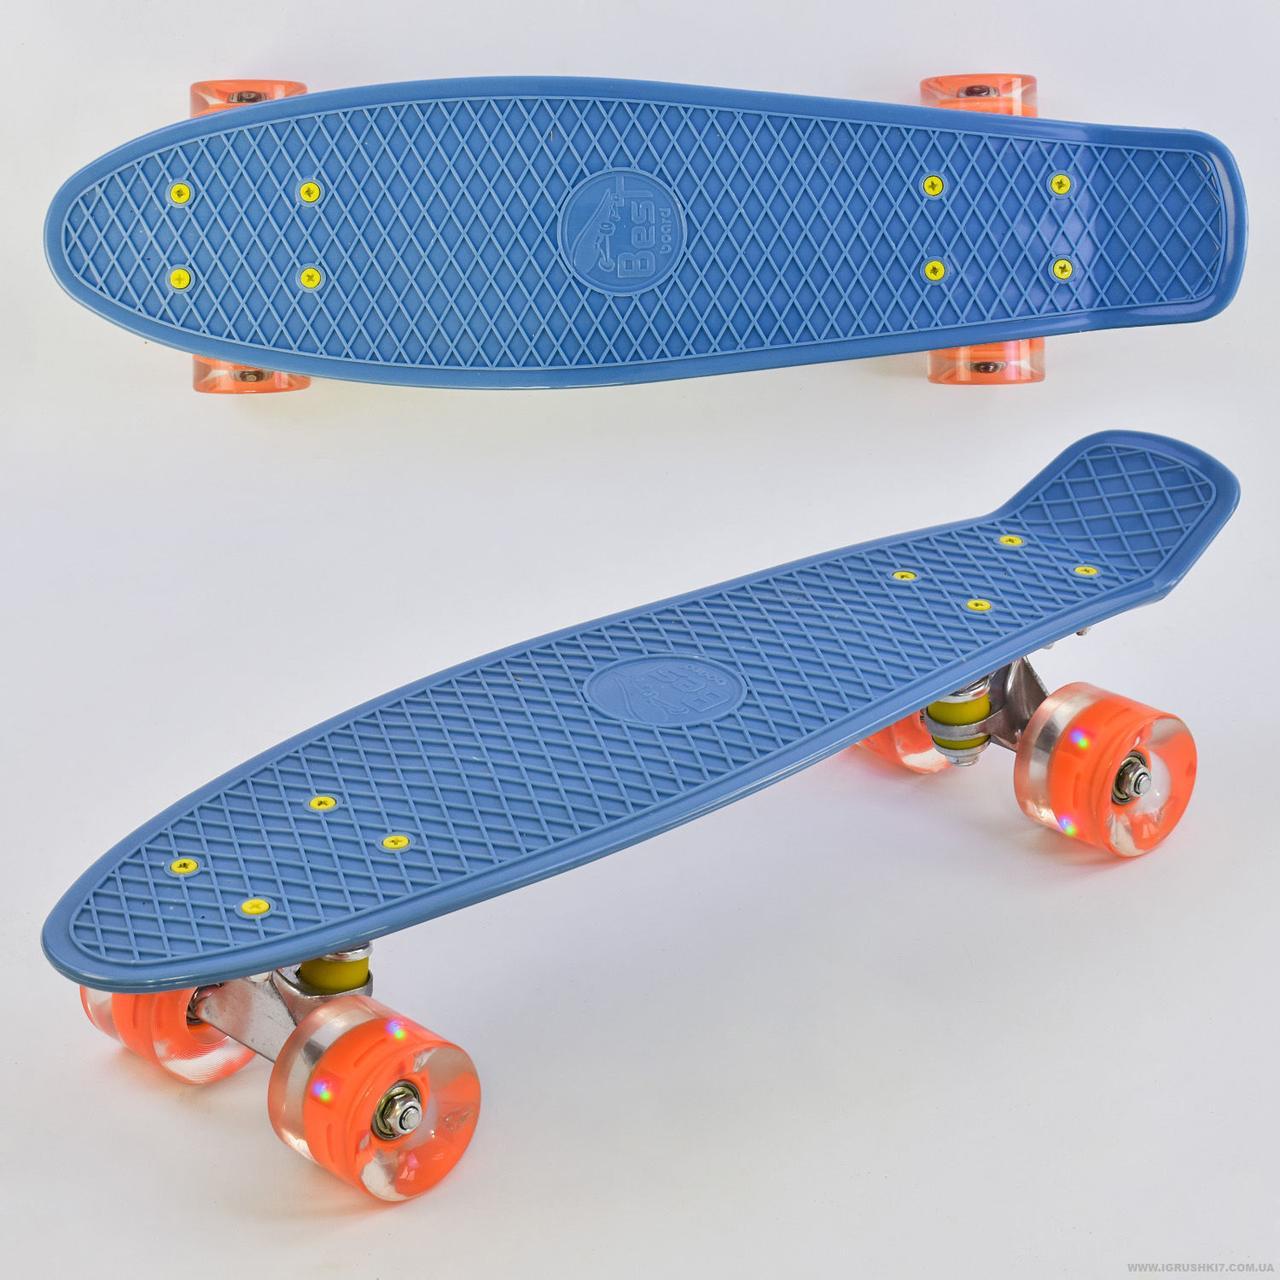 Скейт Пенни борд 5050 (8) Best Board, ГОЛУБОЙ, СВЕТ, доска=55см(игр7)